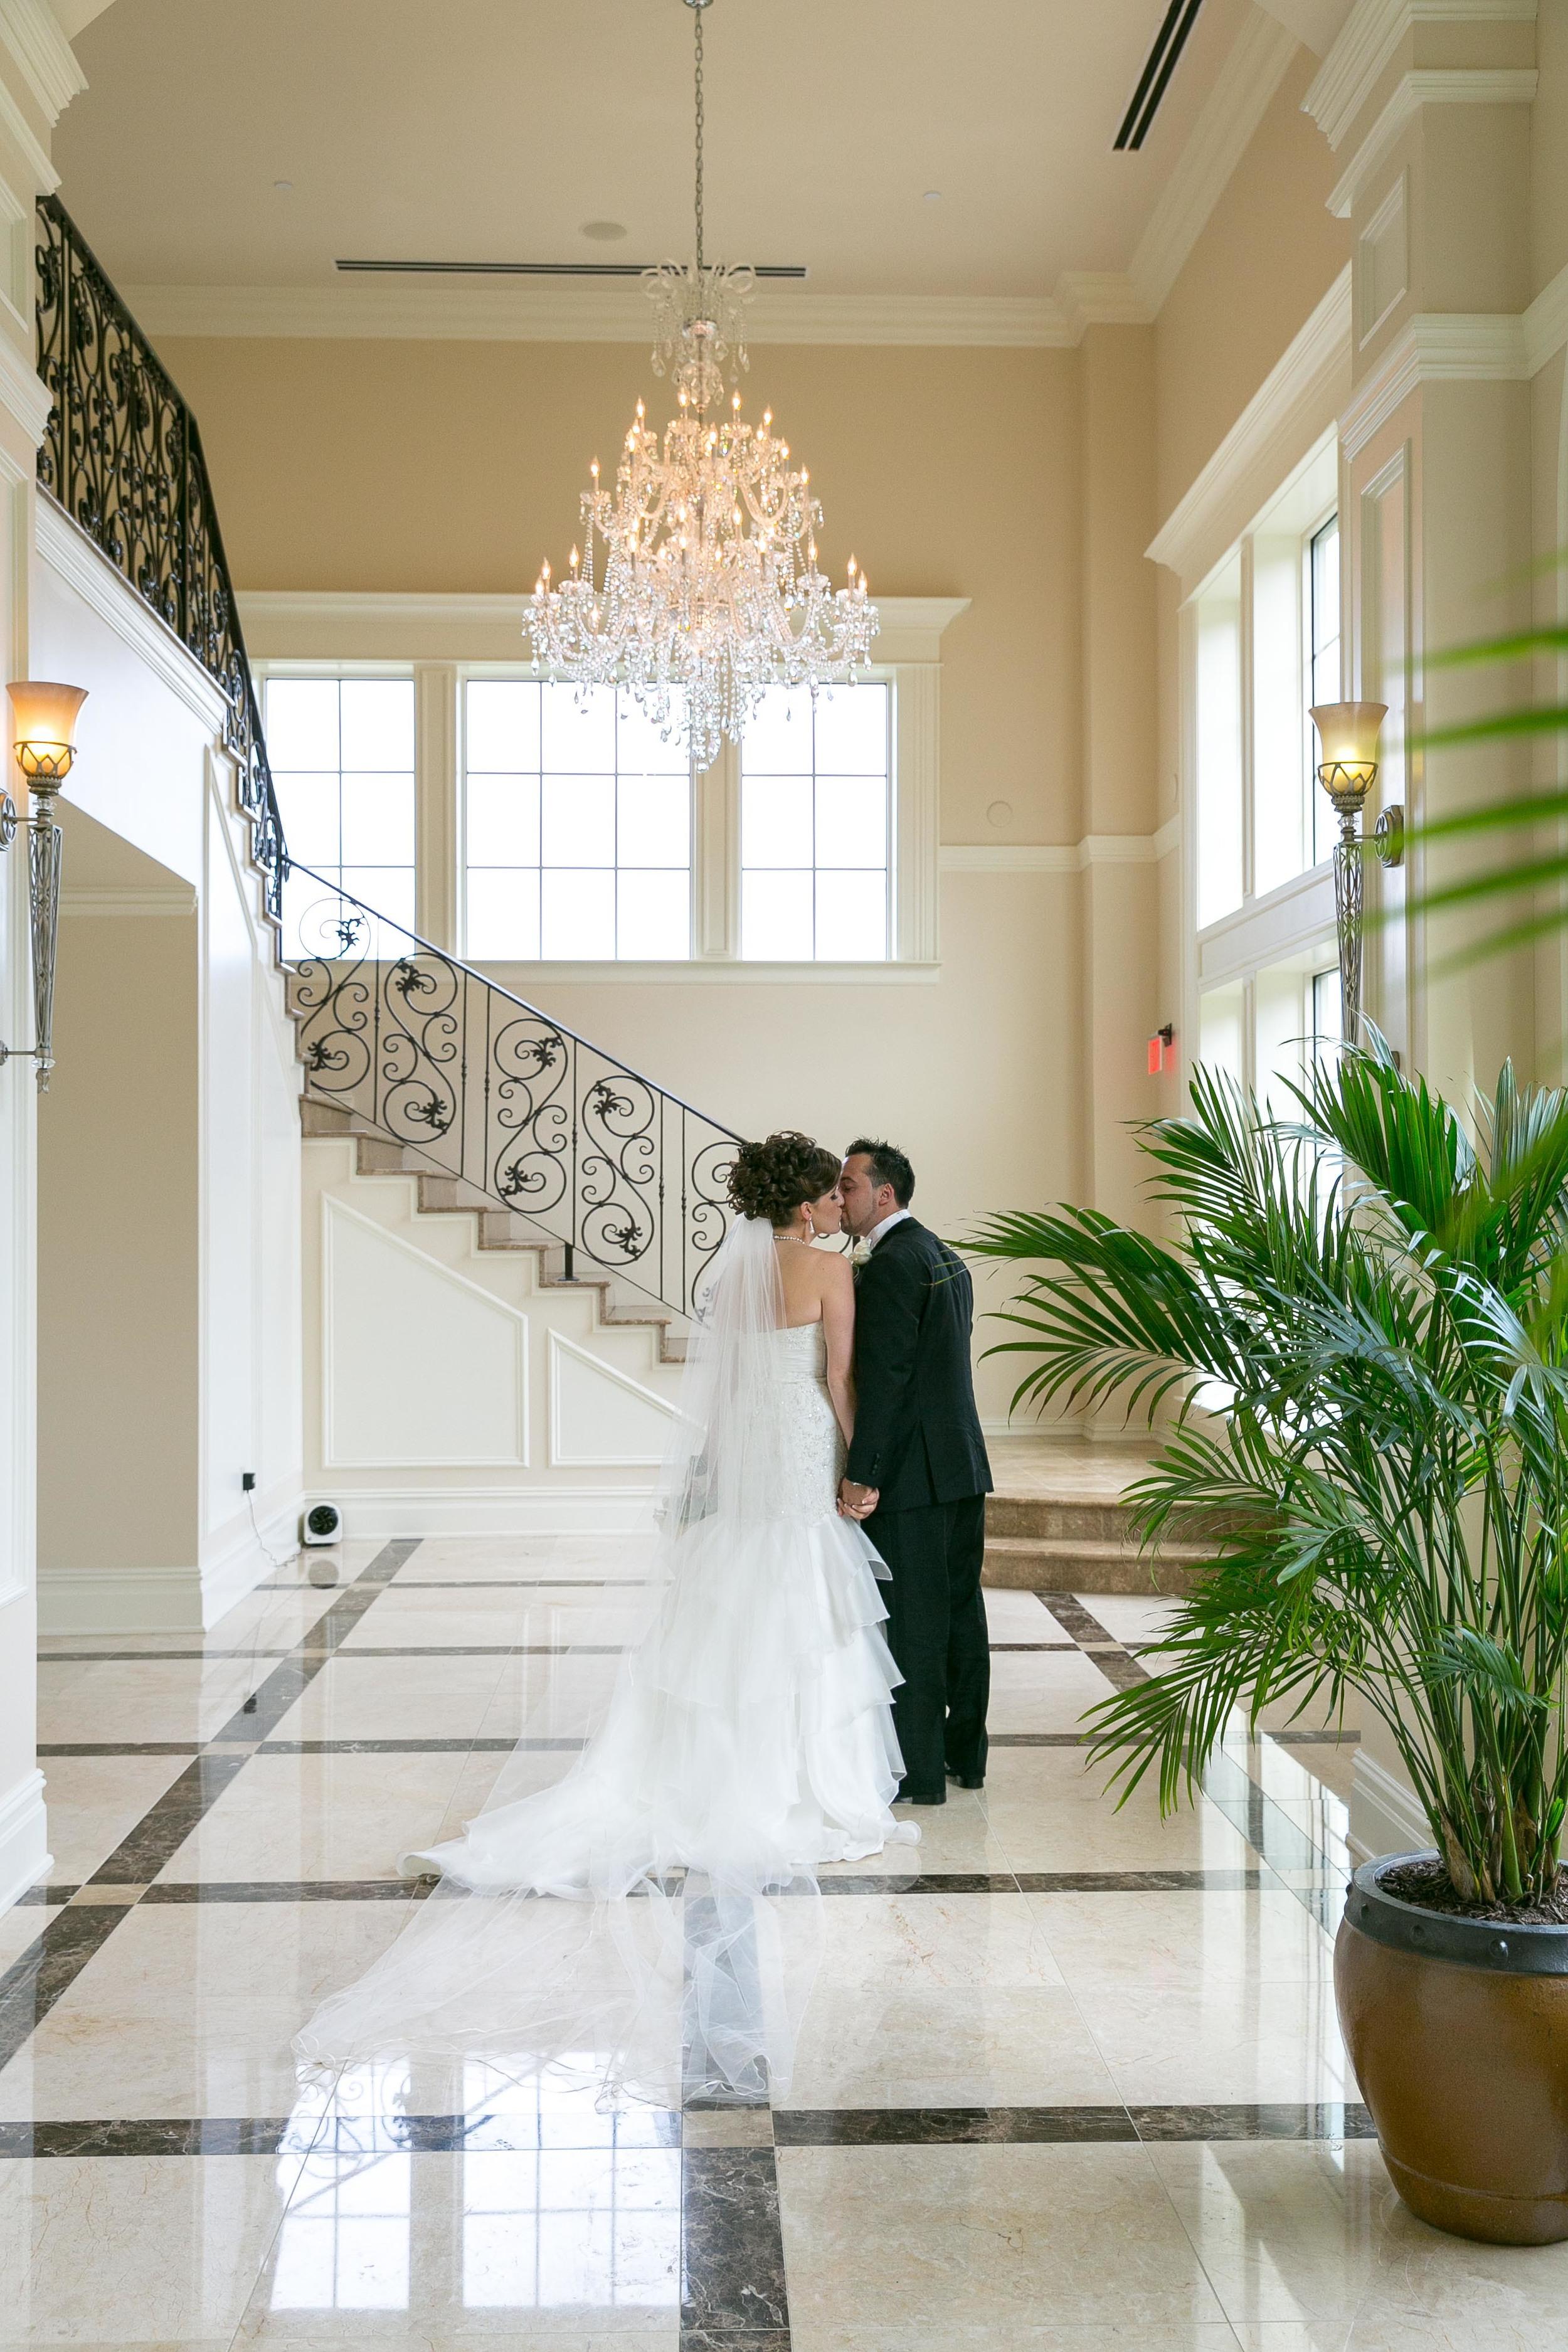 Albanian-Wedding-Aria-Prospect-CT-Documentary-Photography-by-Jacek-Dolata-2.jpg